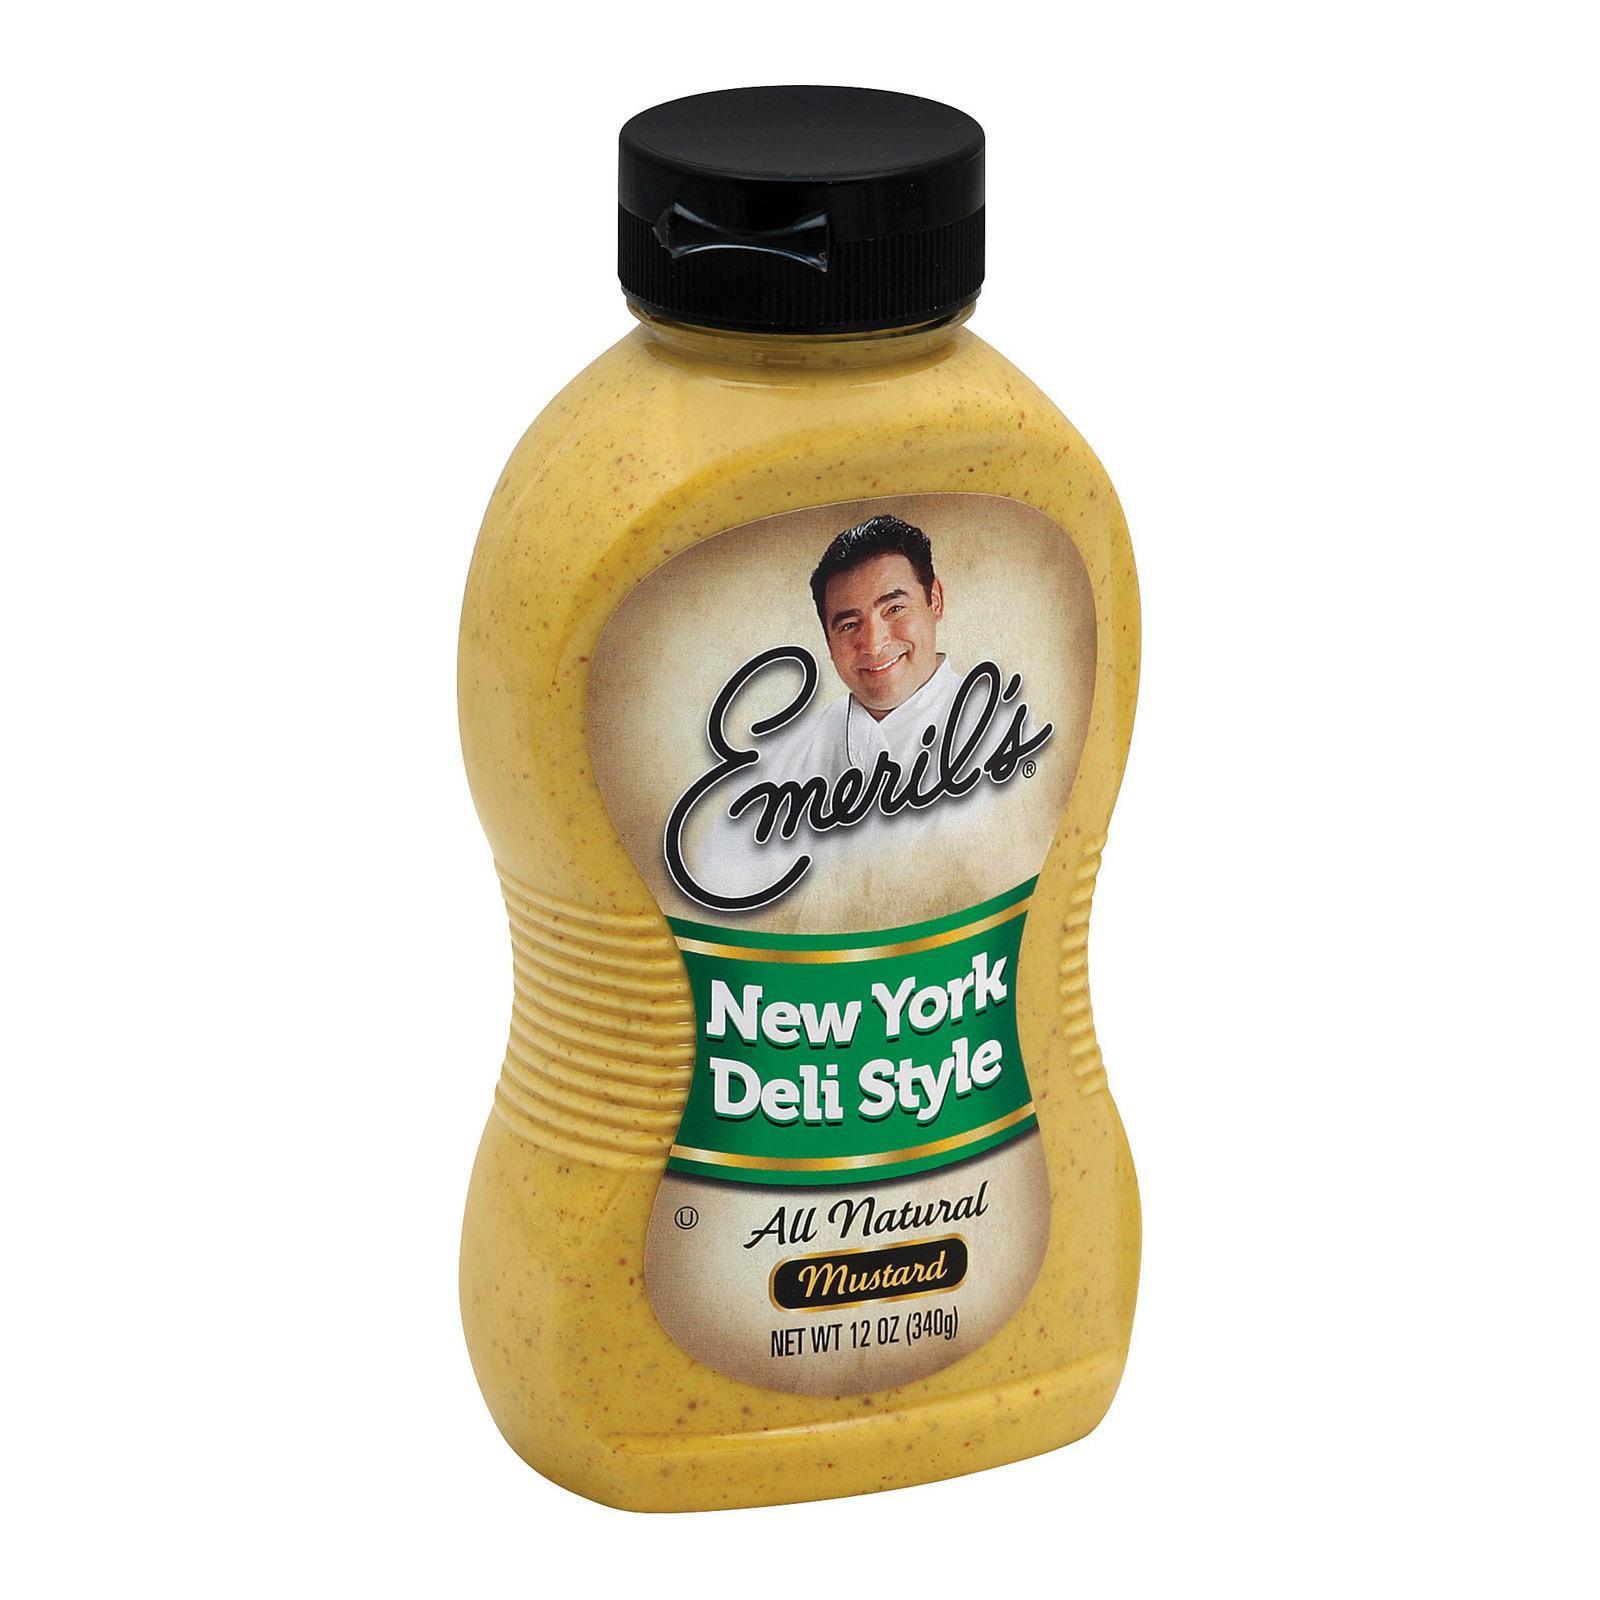 Emeril Mustard - New York Deli Style - 12 oz.